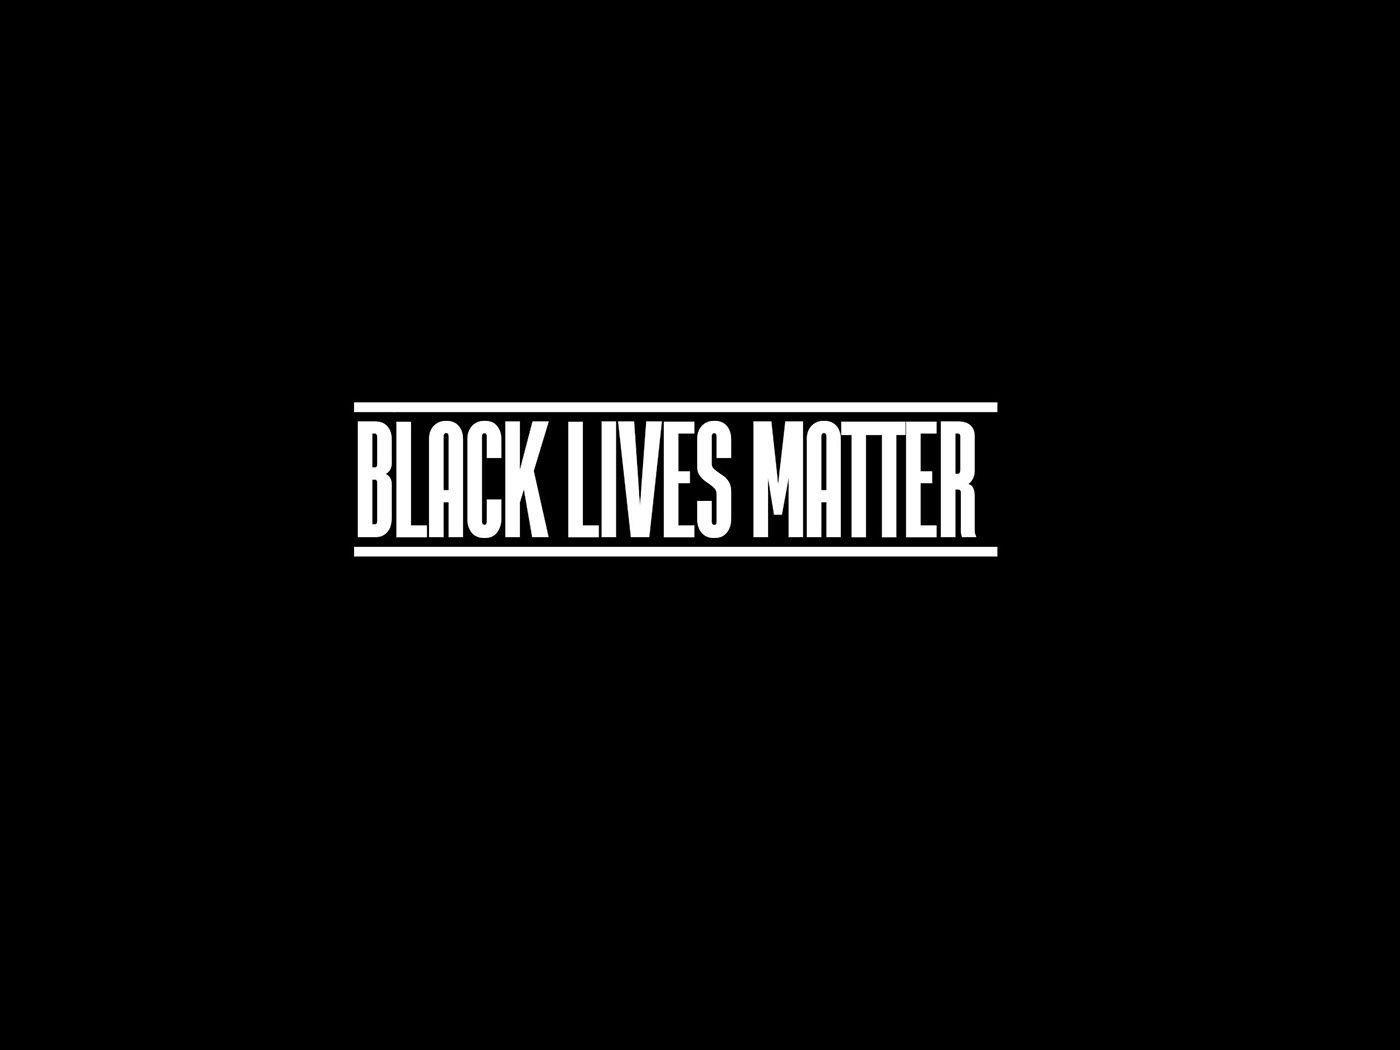 black lives matter wallpaper 71341